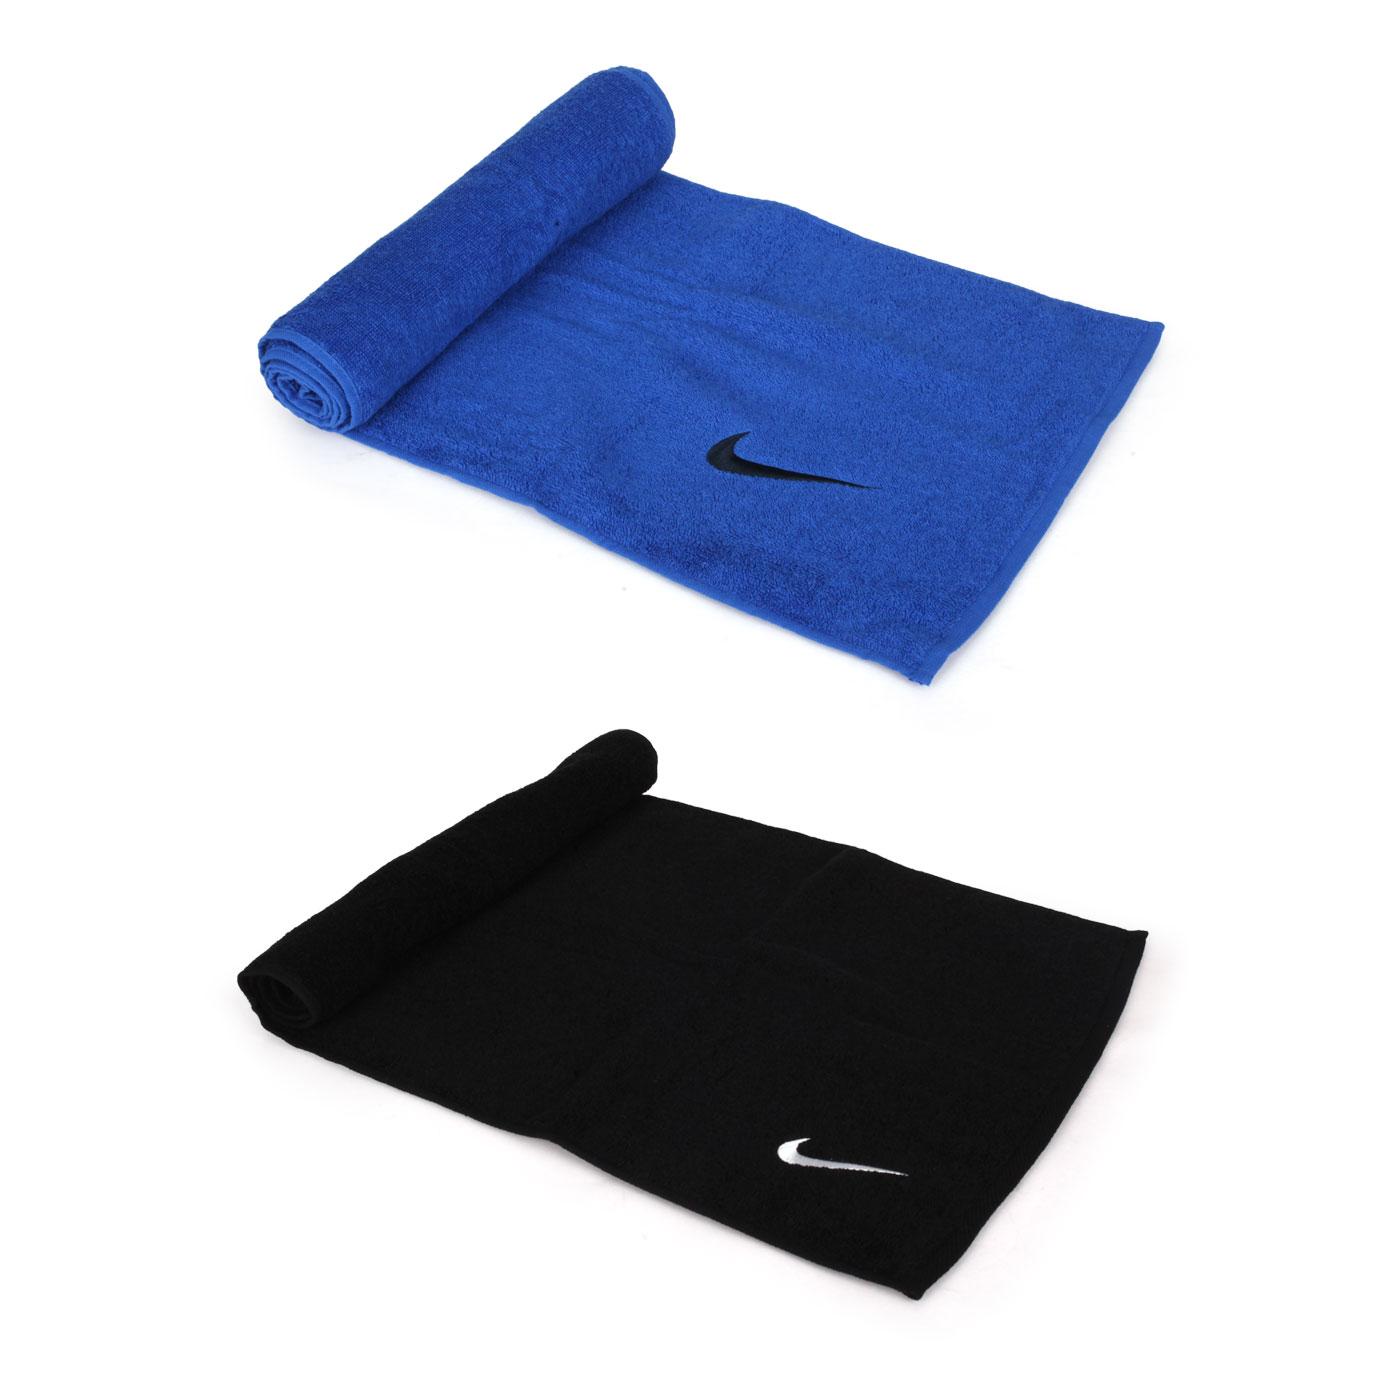 NIKE SOLID CORE長型毛巾 N1001540010NS